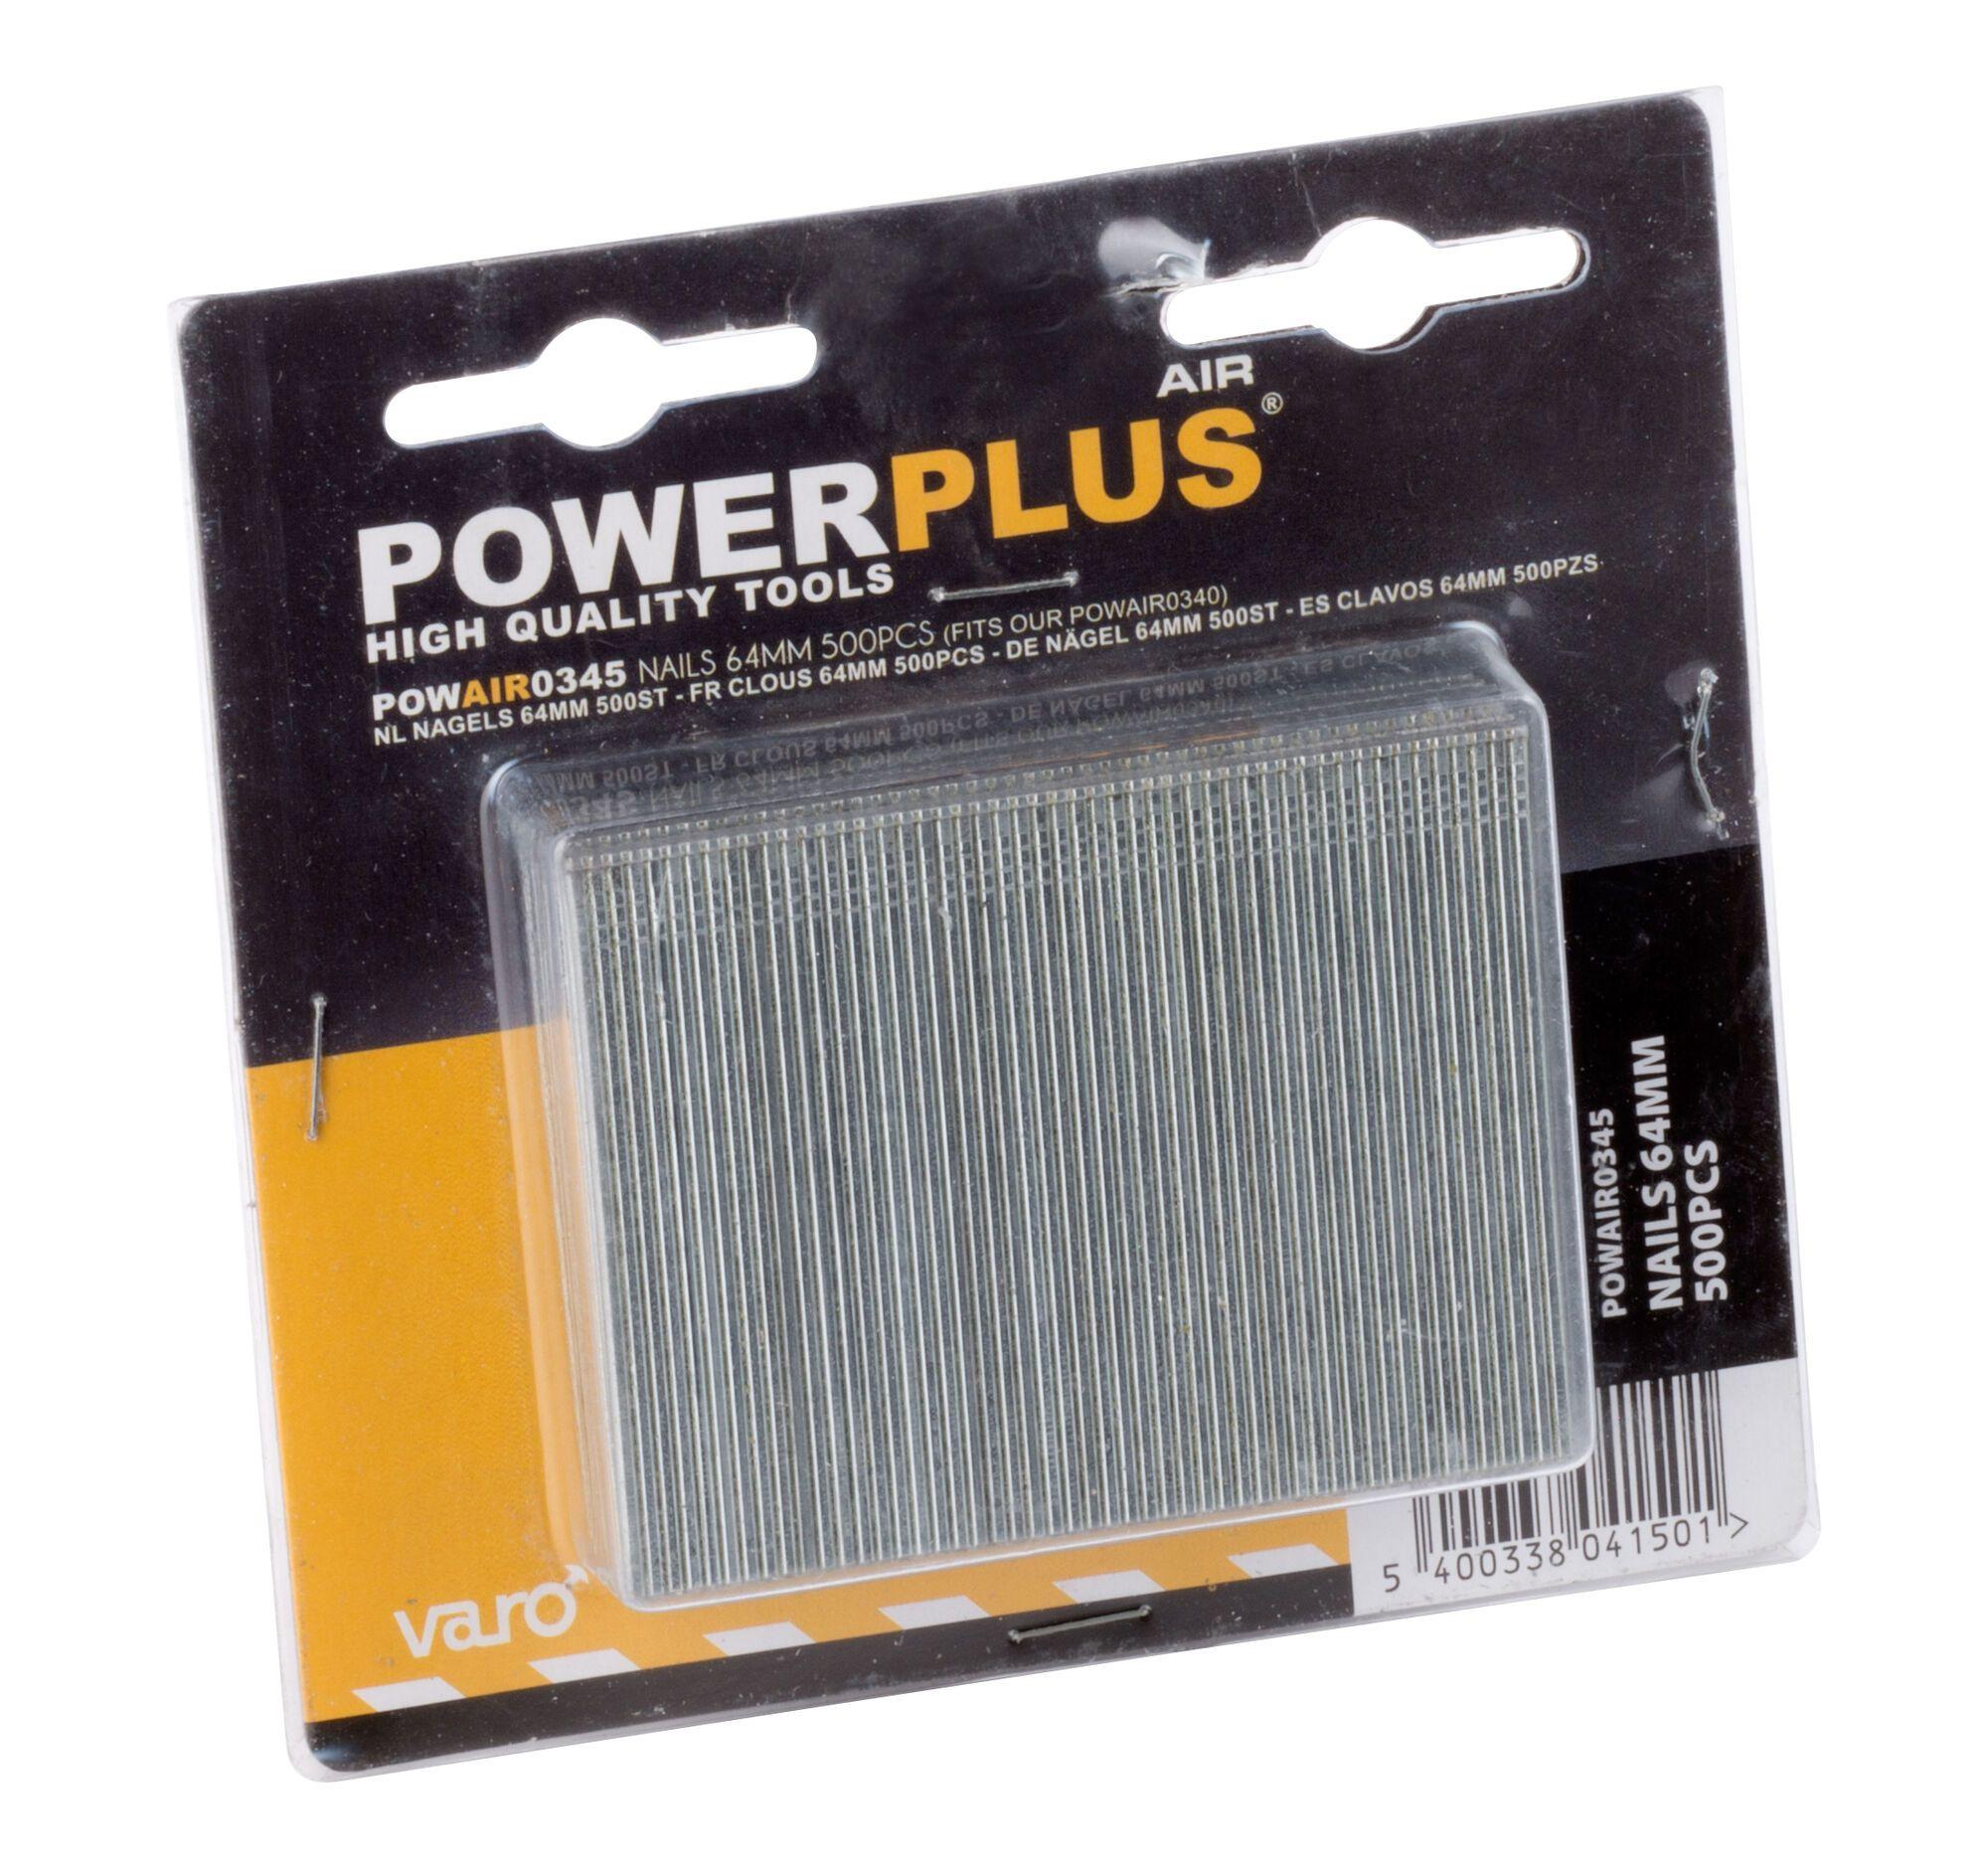 Powerplus POWAIR0345 500 Spijkers 64 mm | Stalen nagels voor nagelapparaat